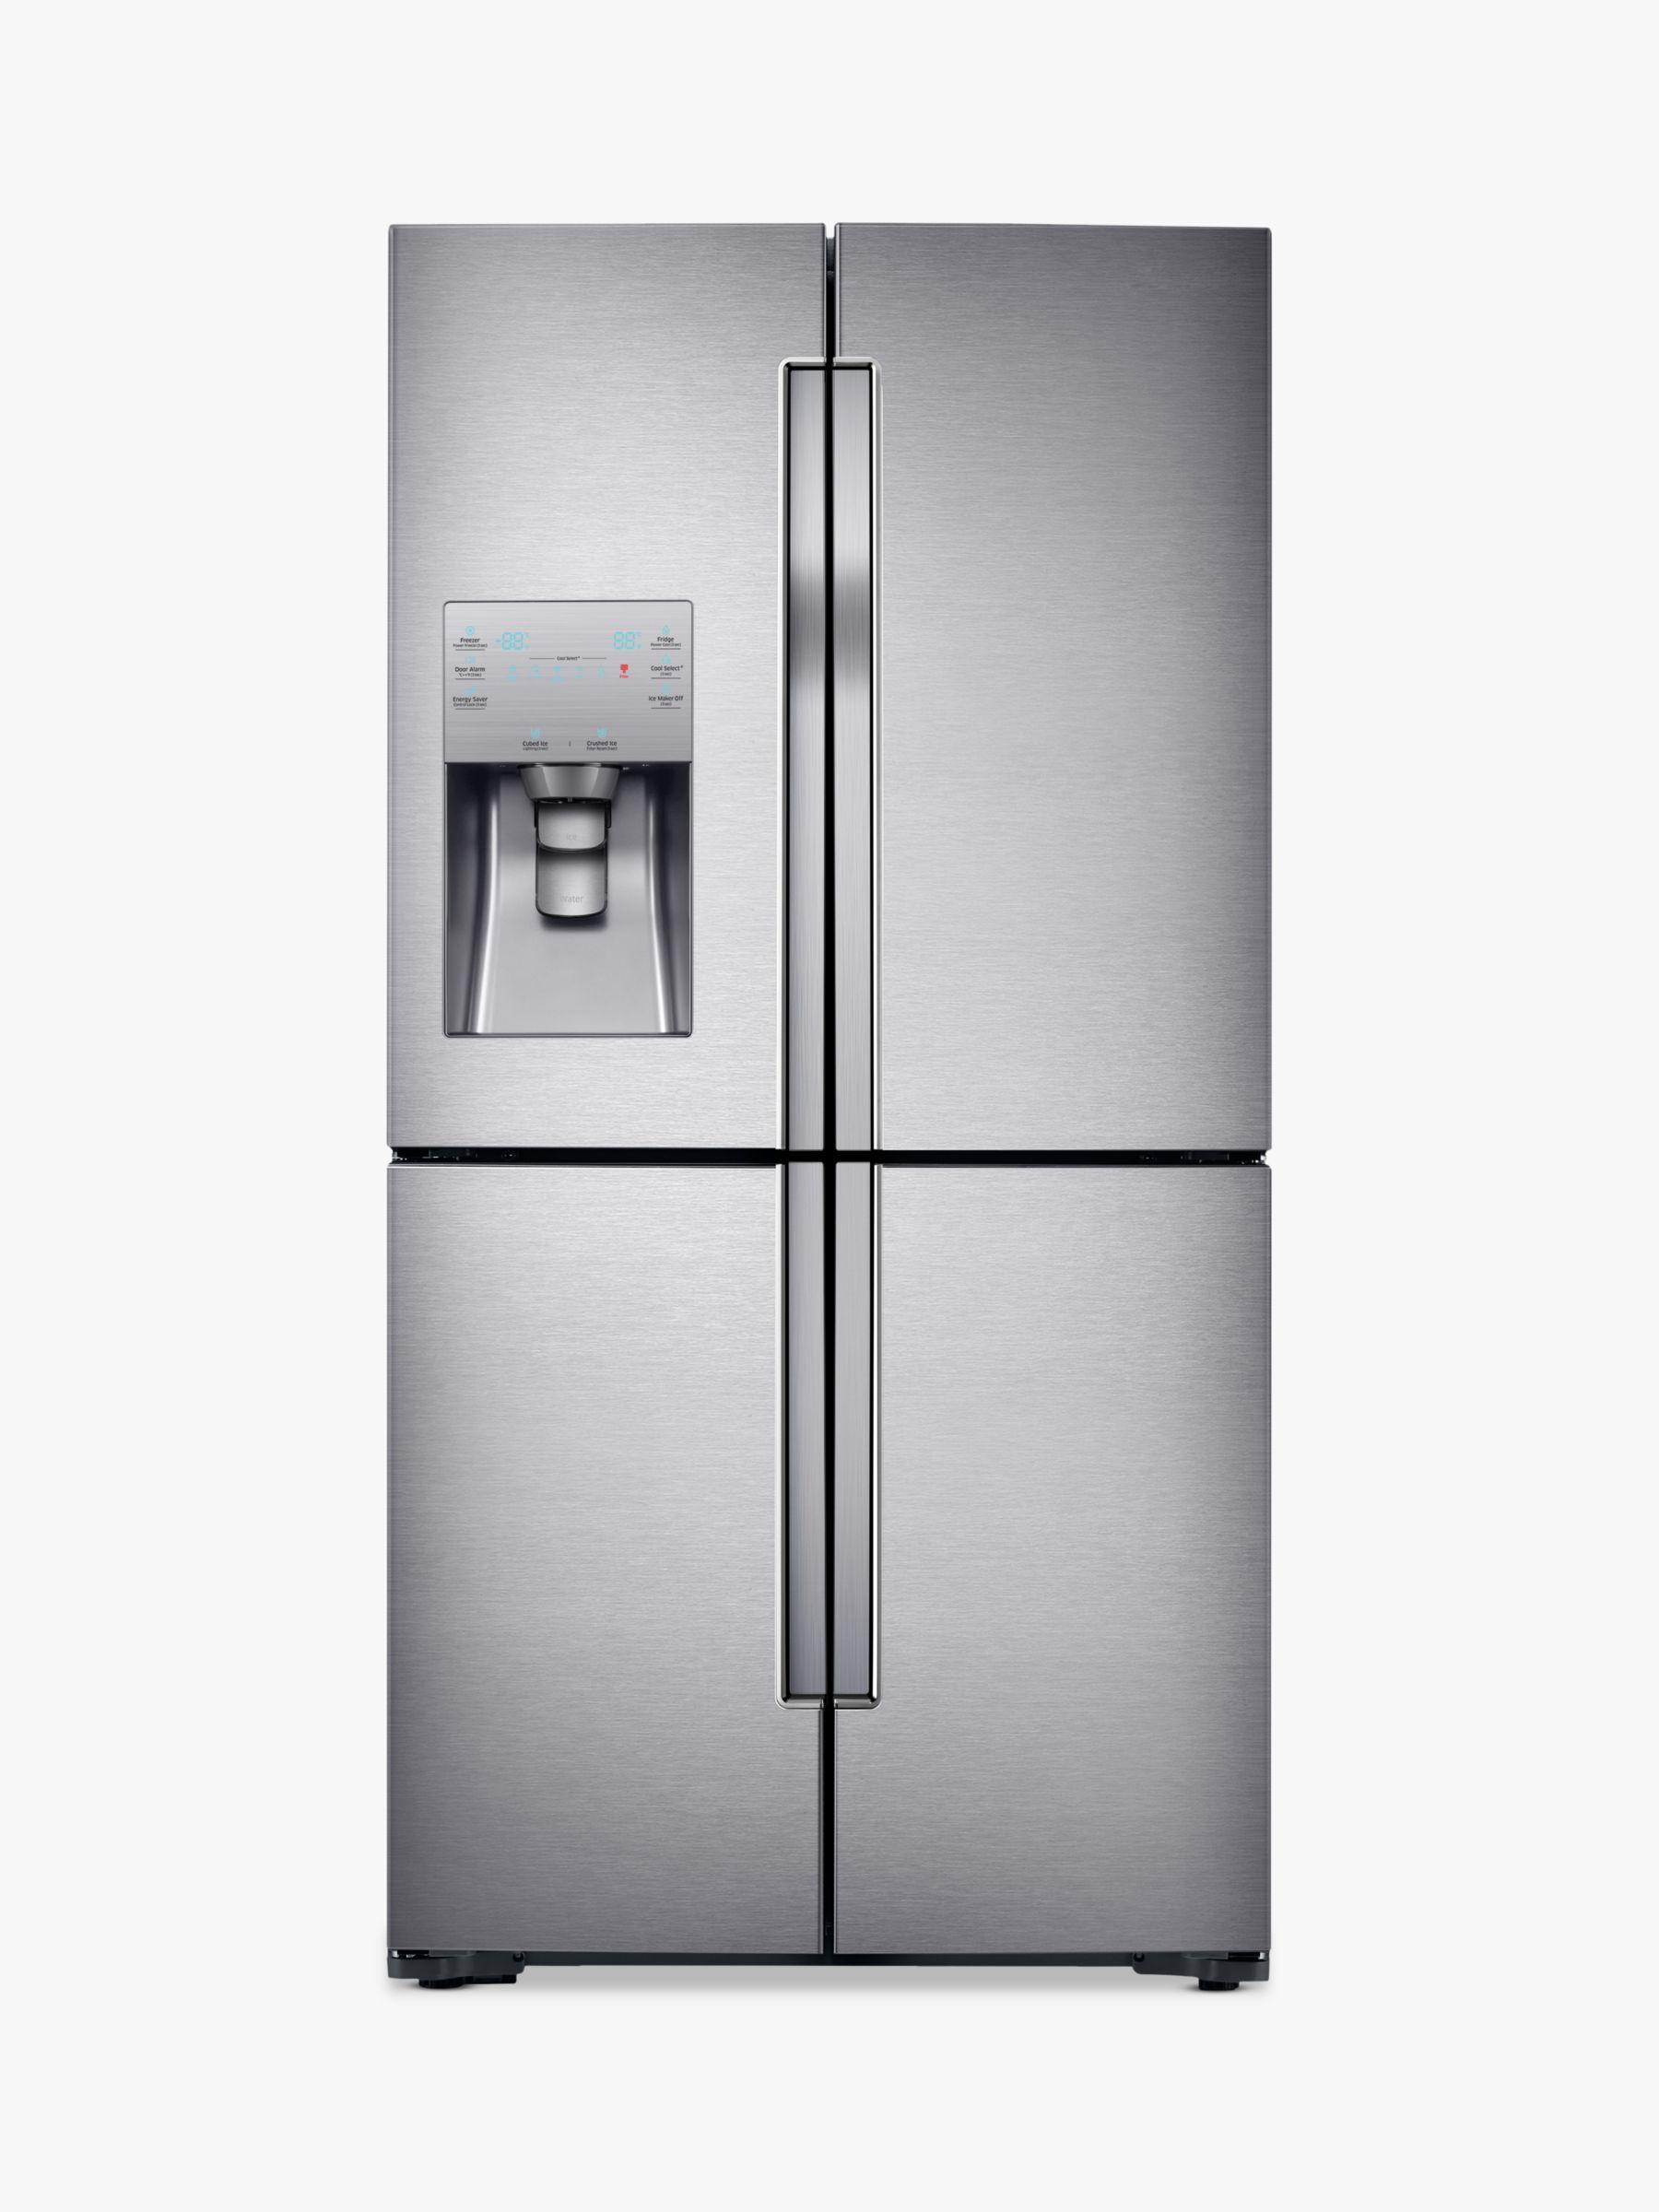 Samsung Samsung RF56J9040SR 4-Door American Style Fridge Freezer, A+ Energy Rating, 90cm Width, Stainless Steel